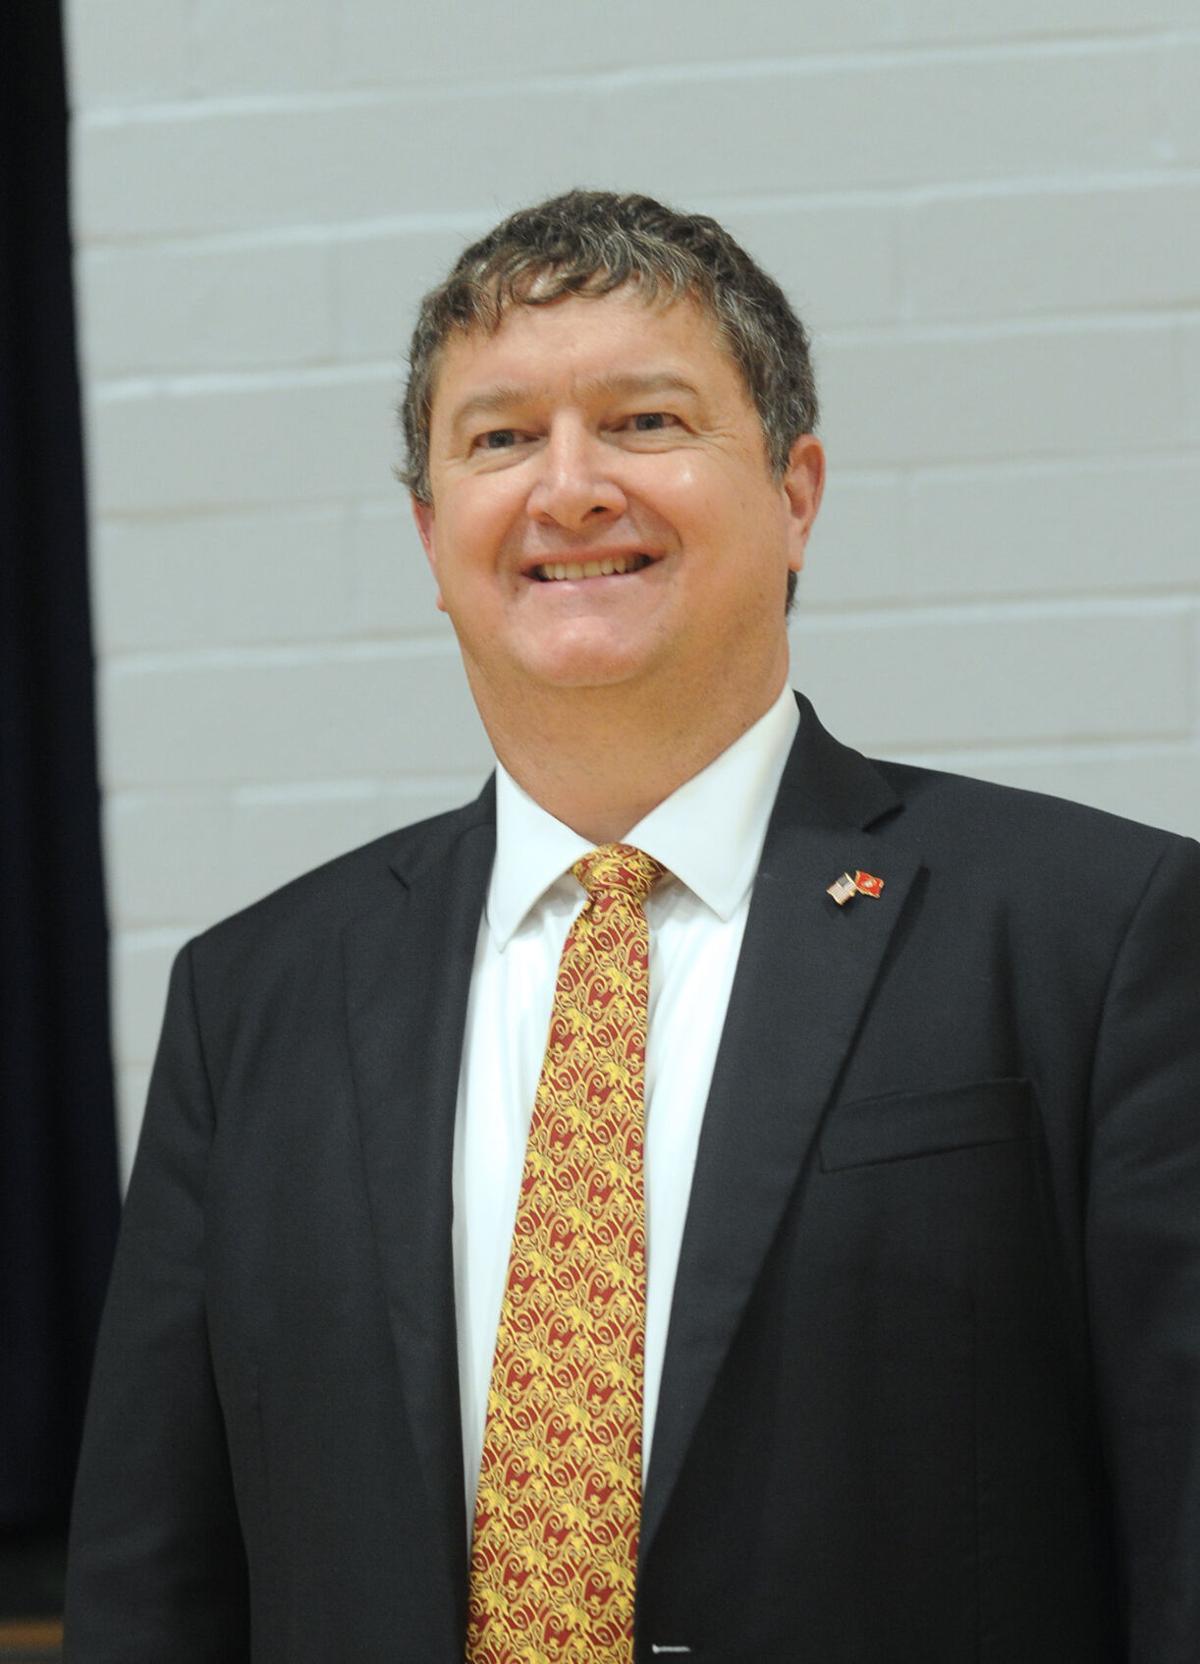 David Hensley